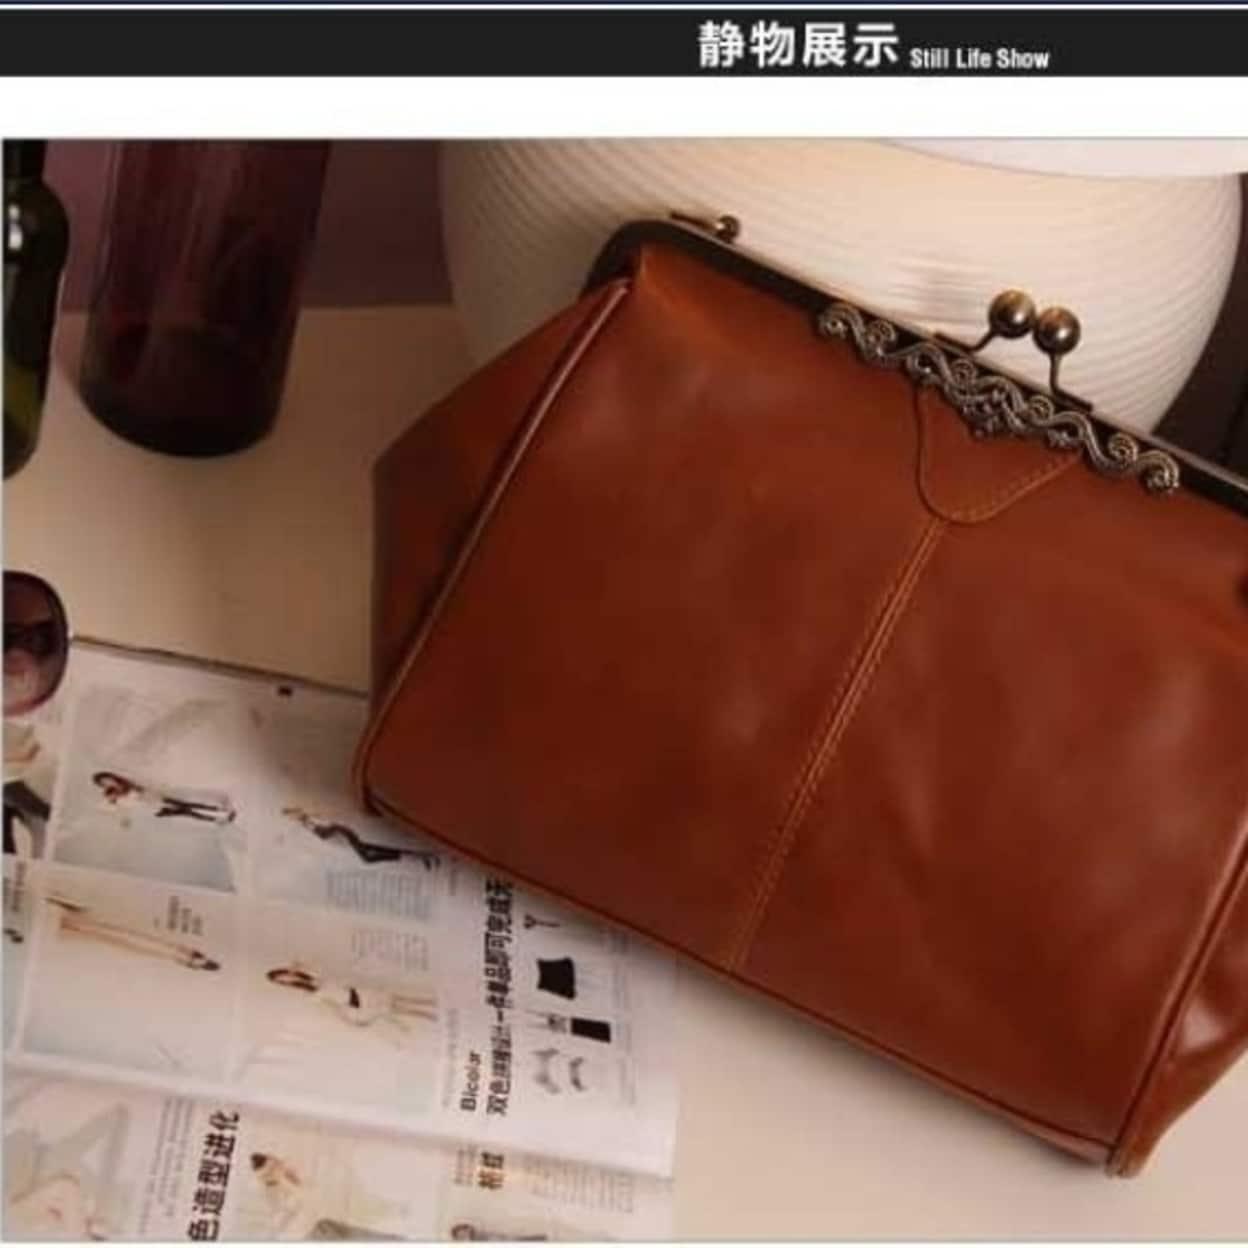 a94cfceb32 Shop Women Messenger Bags Bolsas Femininas Desigual Shoulder Crossbody Bag  PU Leather Retro Clip Lock Black White Blue - On Sale - Free Shipping On  Orders ...